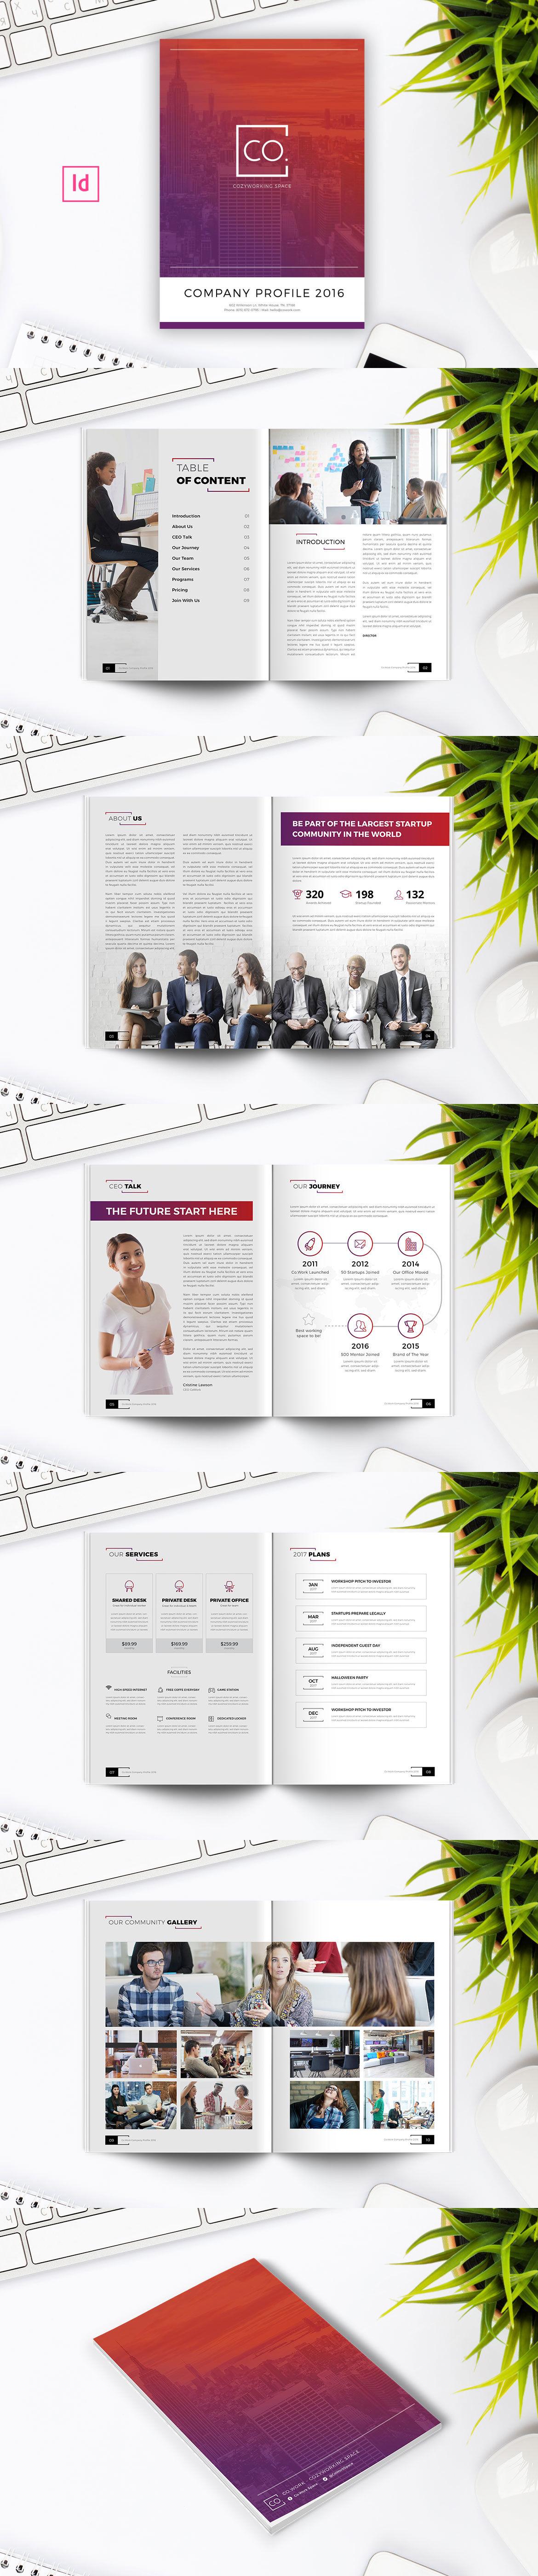 Company Profile Template InDesign INDD   Company Profile Tempaltes ...